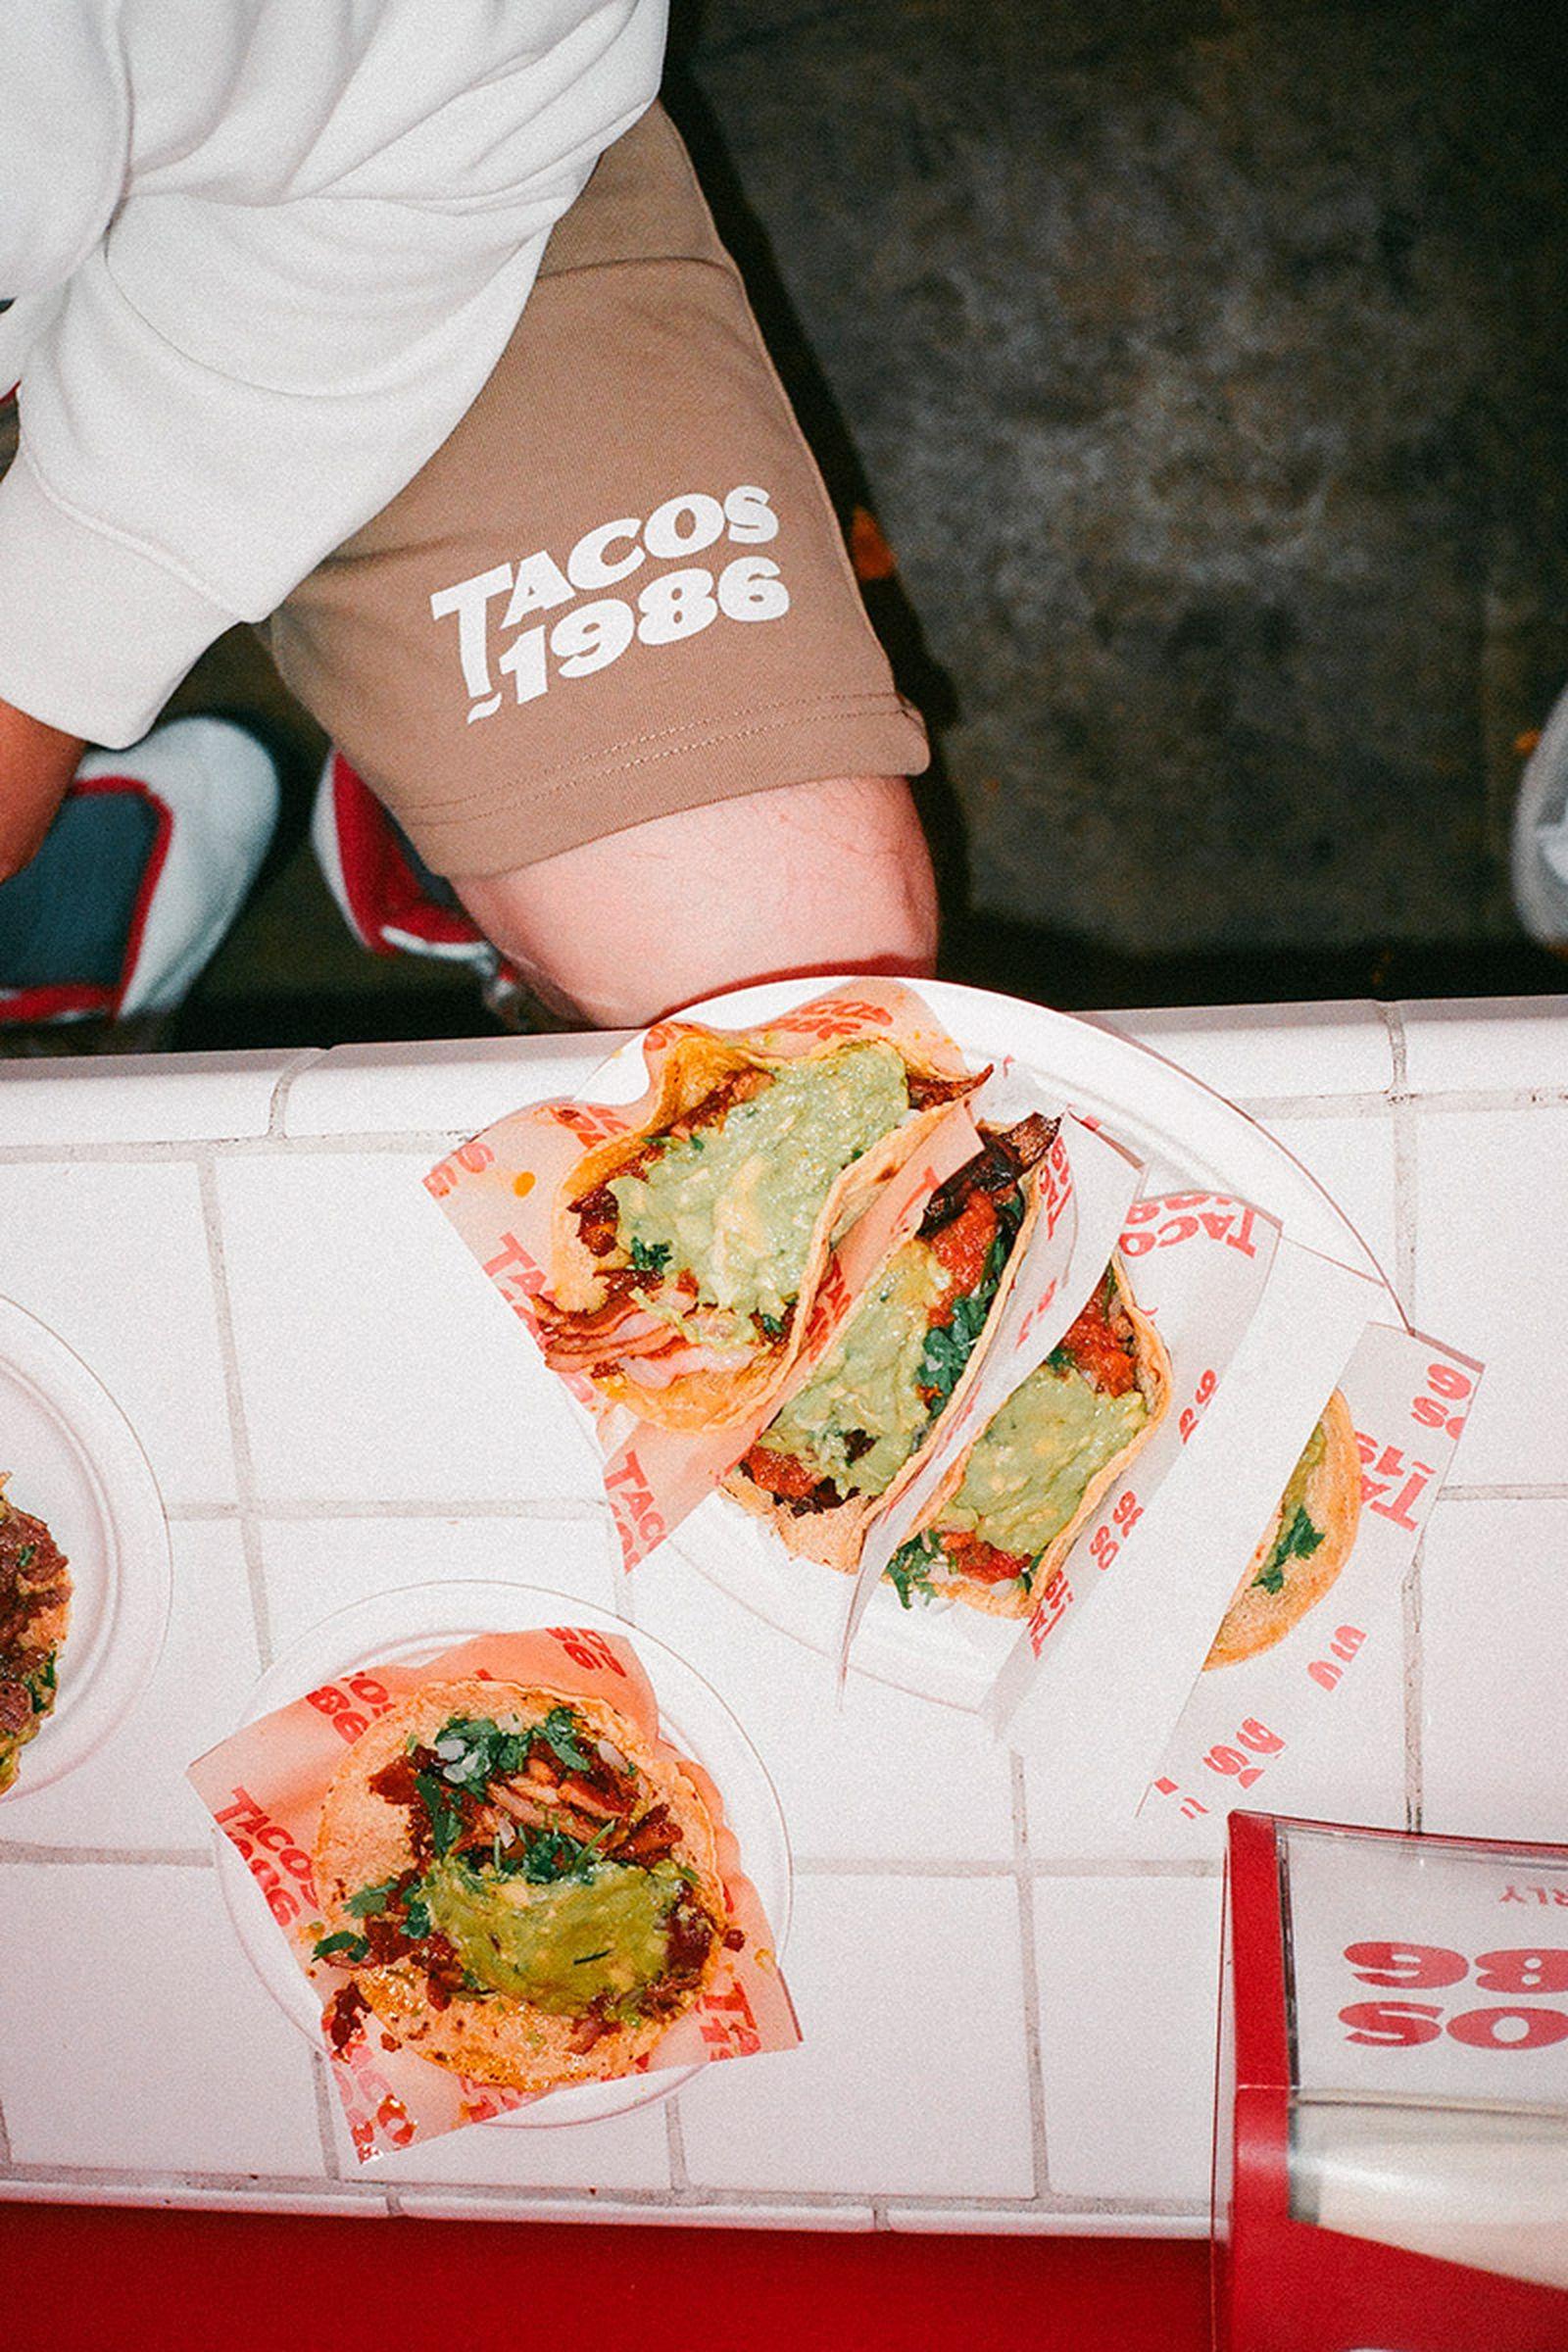 tacos-1986-x-hm-blank-staples-08